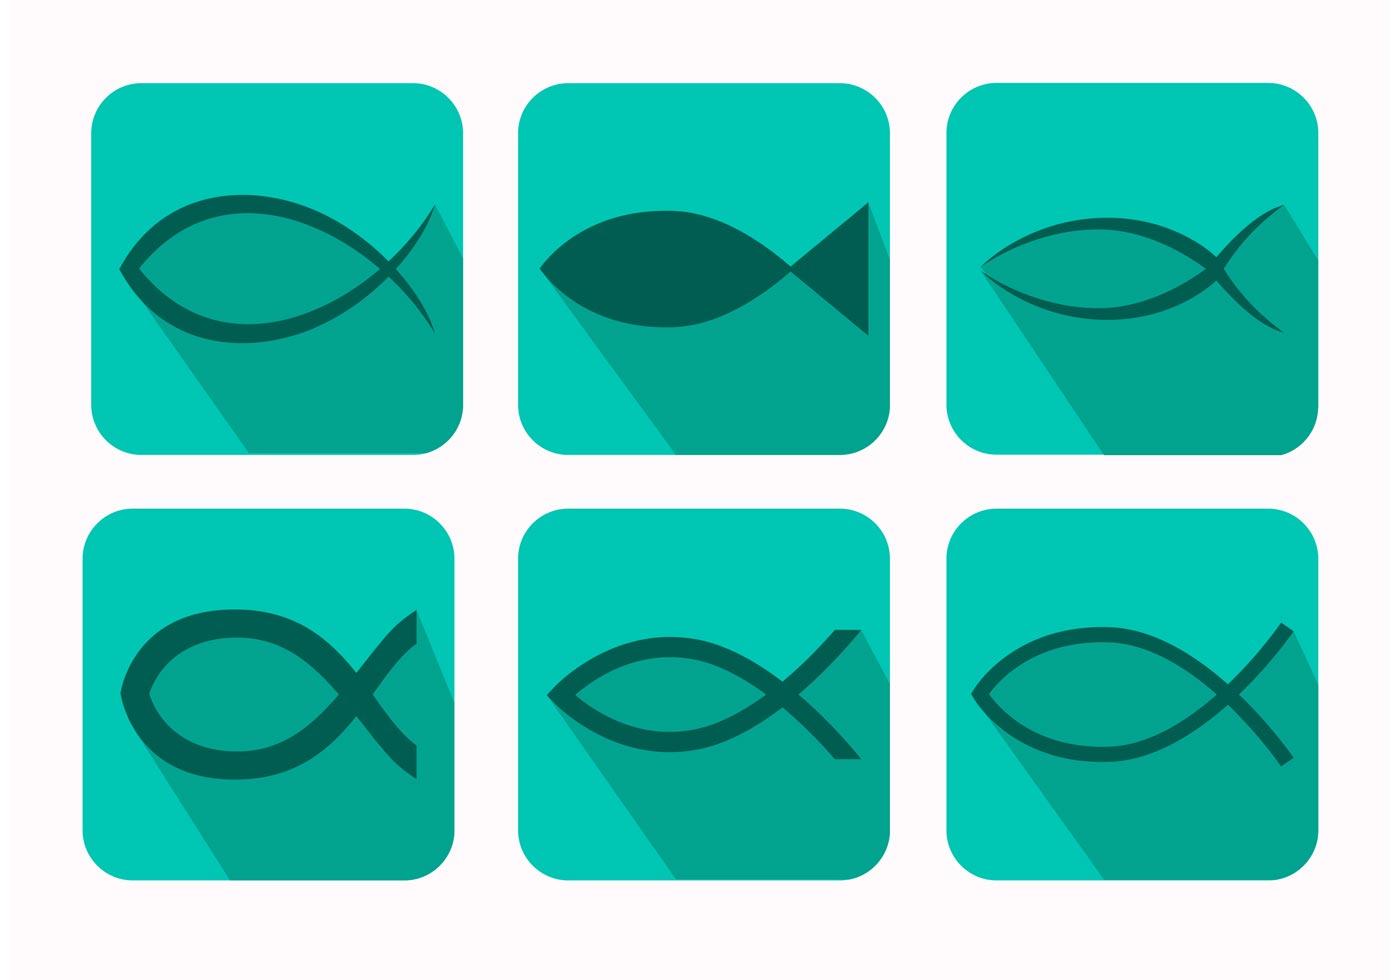 Jesus fish symbol vector jesus fish symbol vector photo22 biocorpaavc